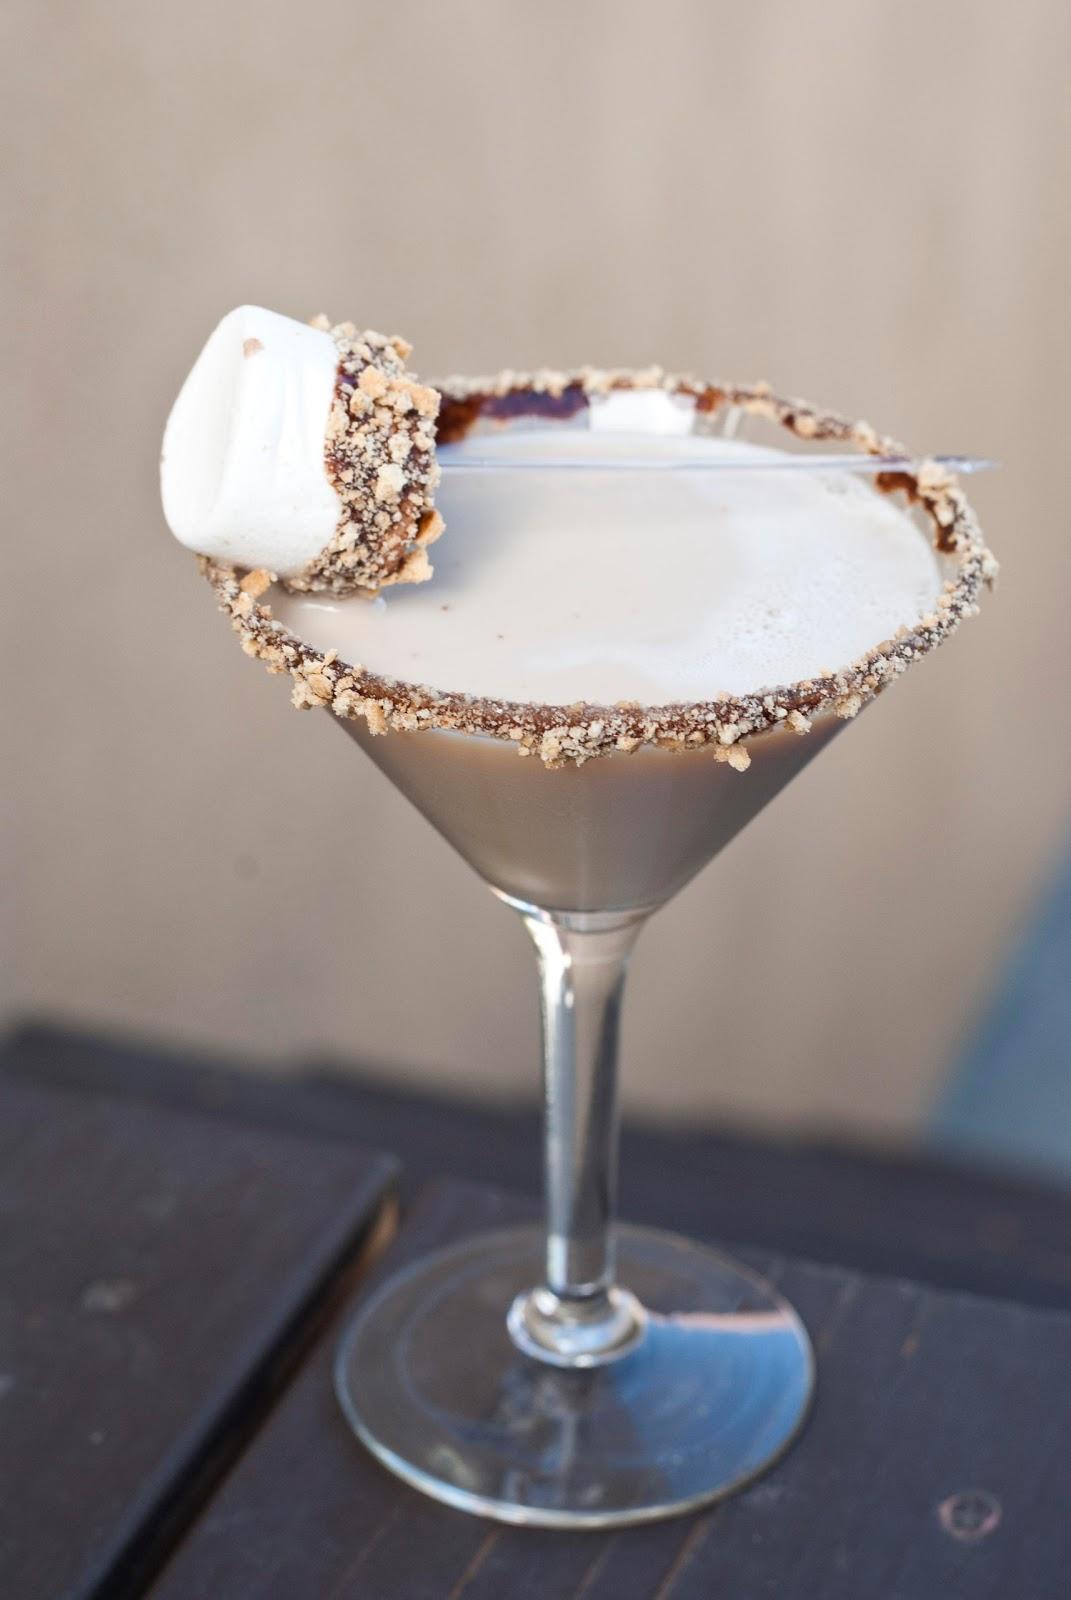 more, S'moretini, marshmallow vodka, white creme de cacao, kahlua ...